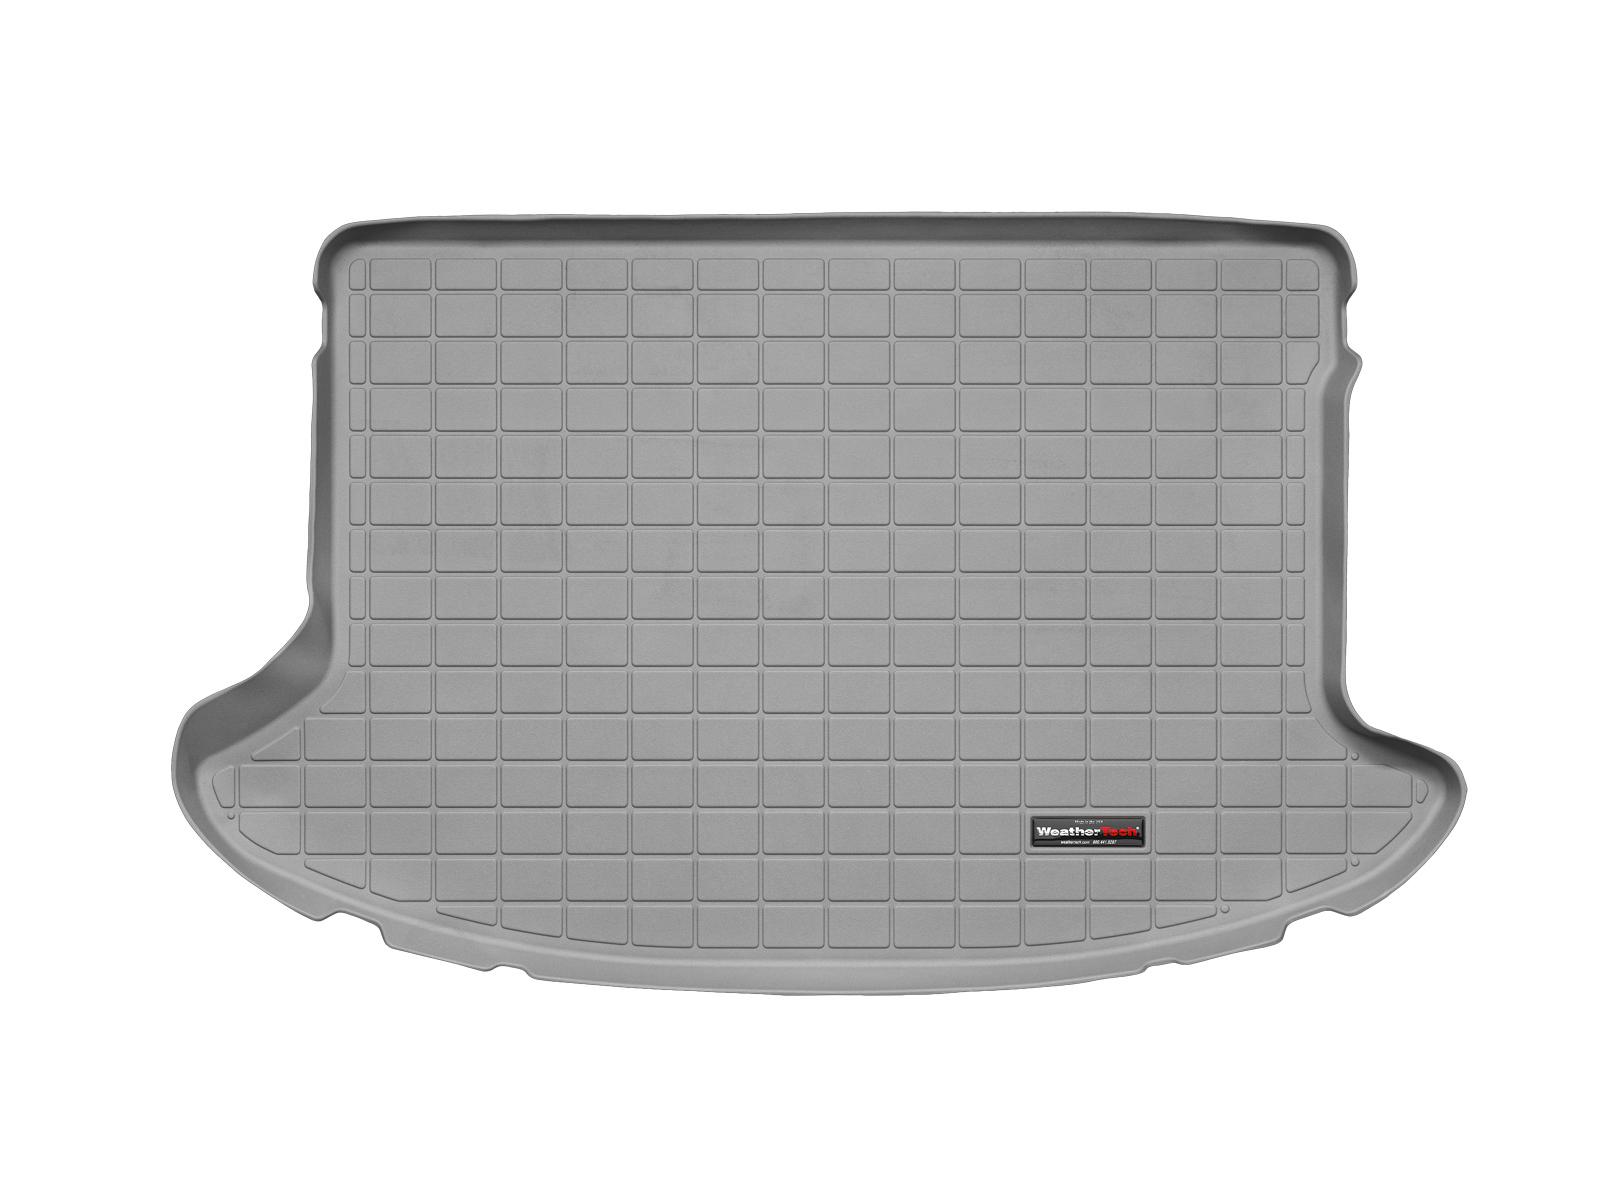 Subaru Impreza WRX STi 11>13 Vasca baule WeatherTech bagagliaio grigio *1185*